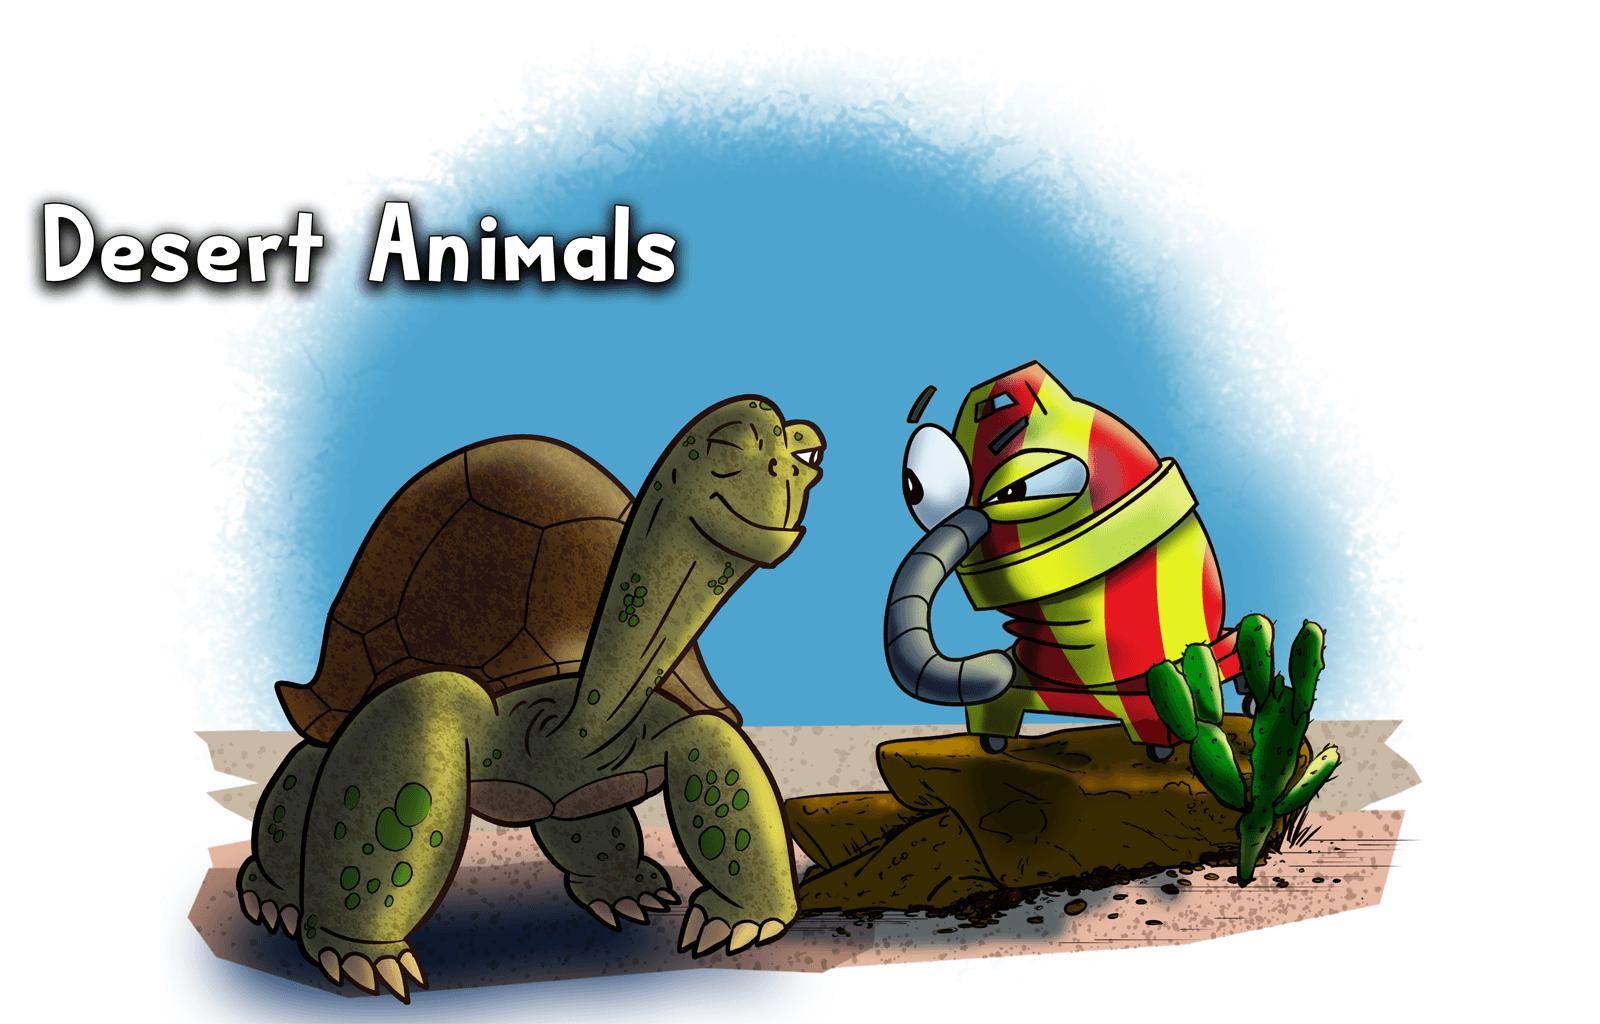 October 13th, Desert Animals